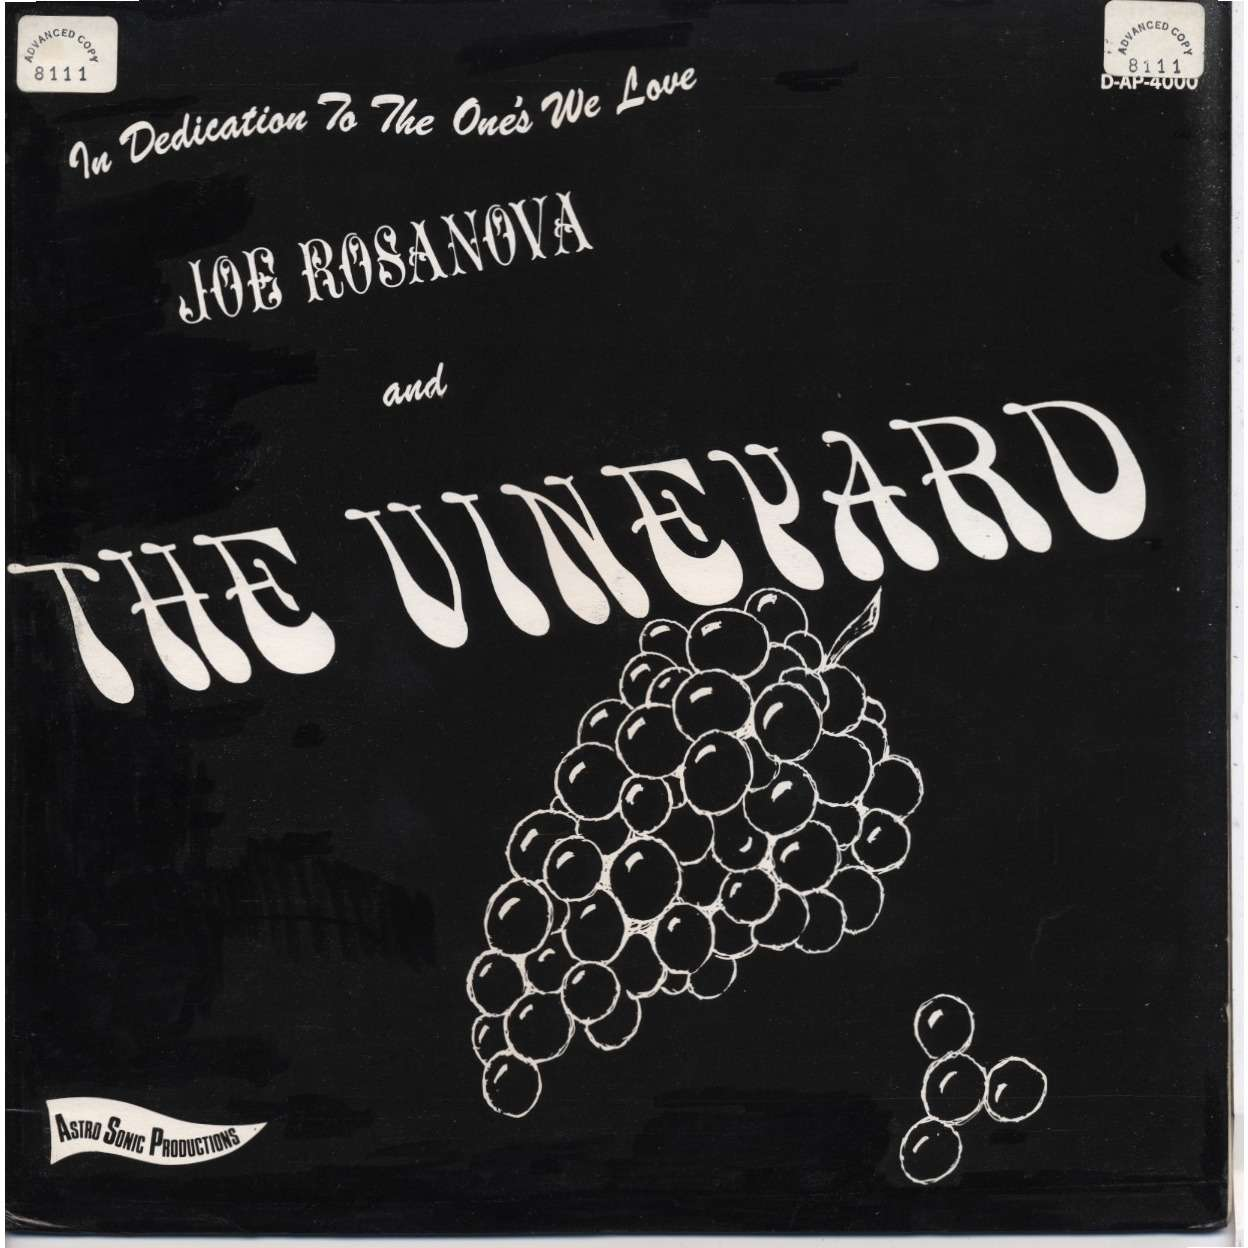 Joe Rosanova The Vineyard In Dedication To The Ones We Love